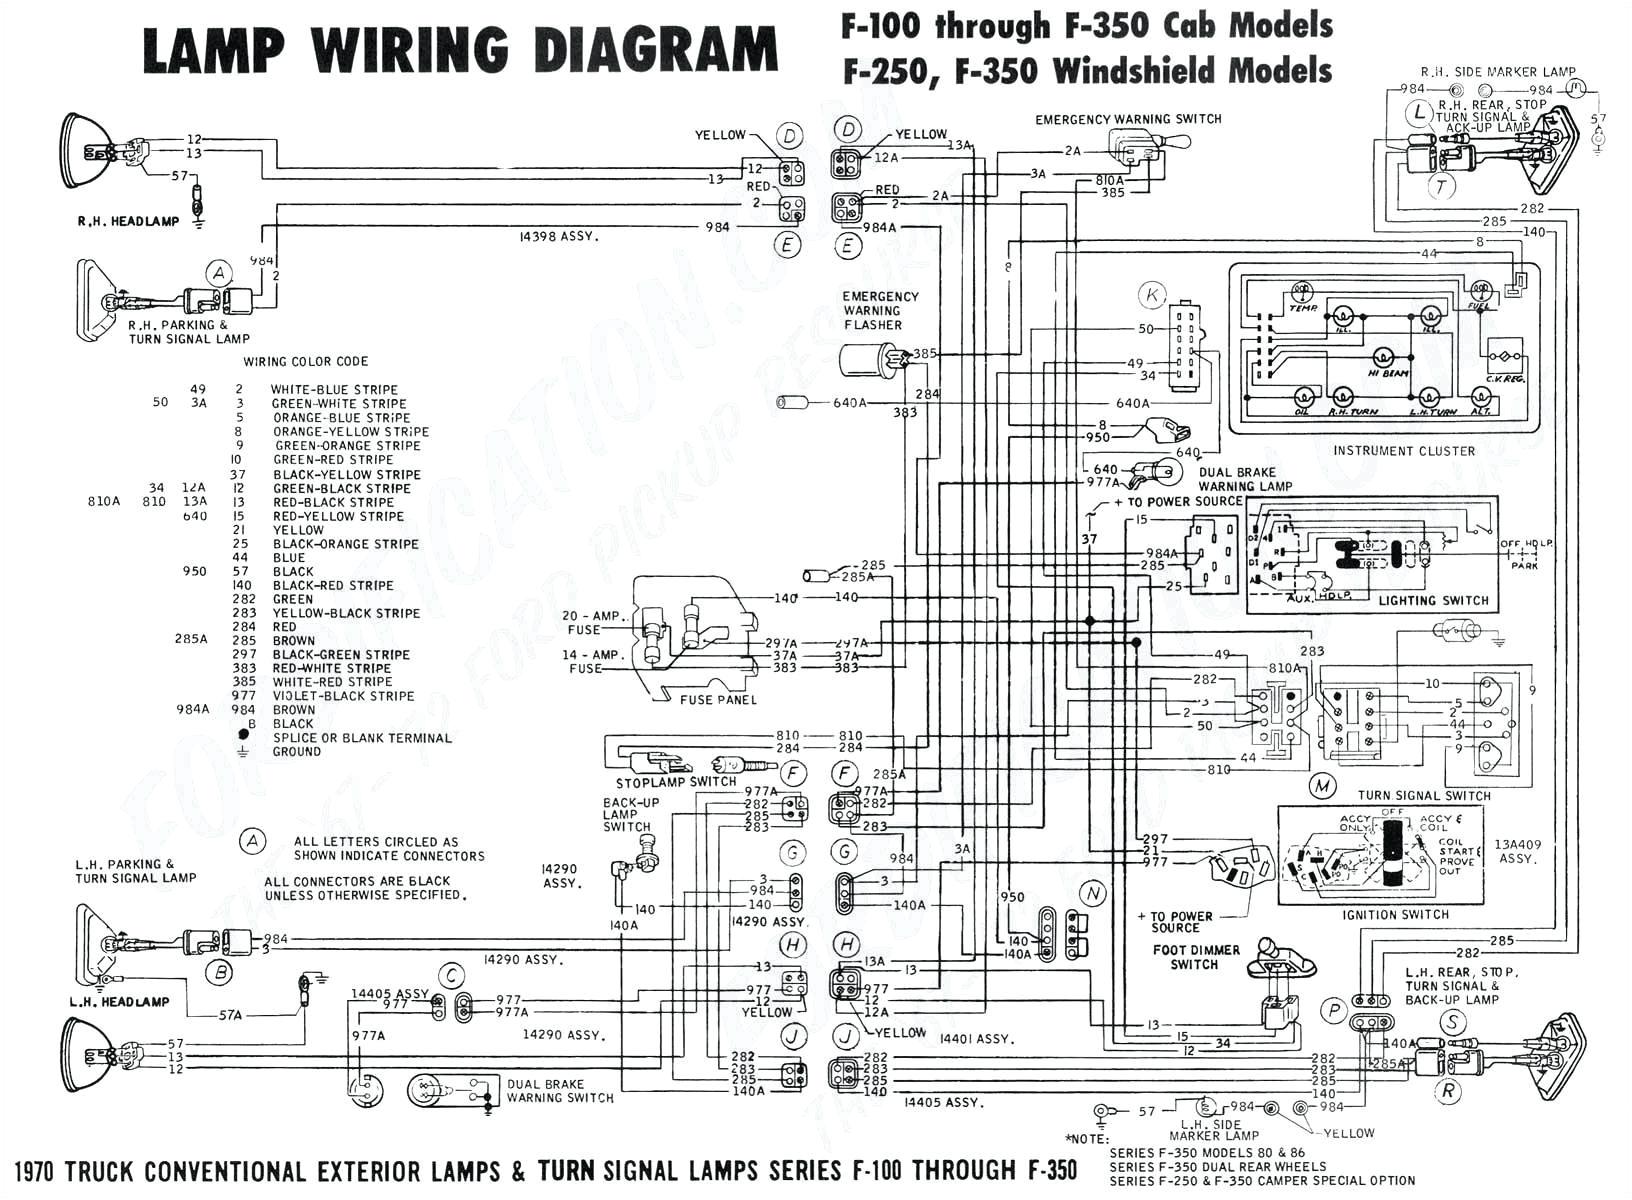 suzuki samurai wiring diagram wiring diagram suzuki samurai trailer wiring